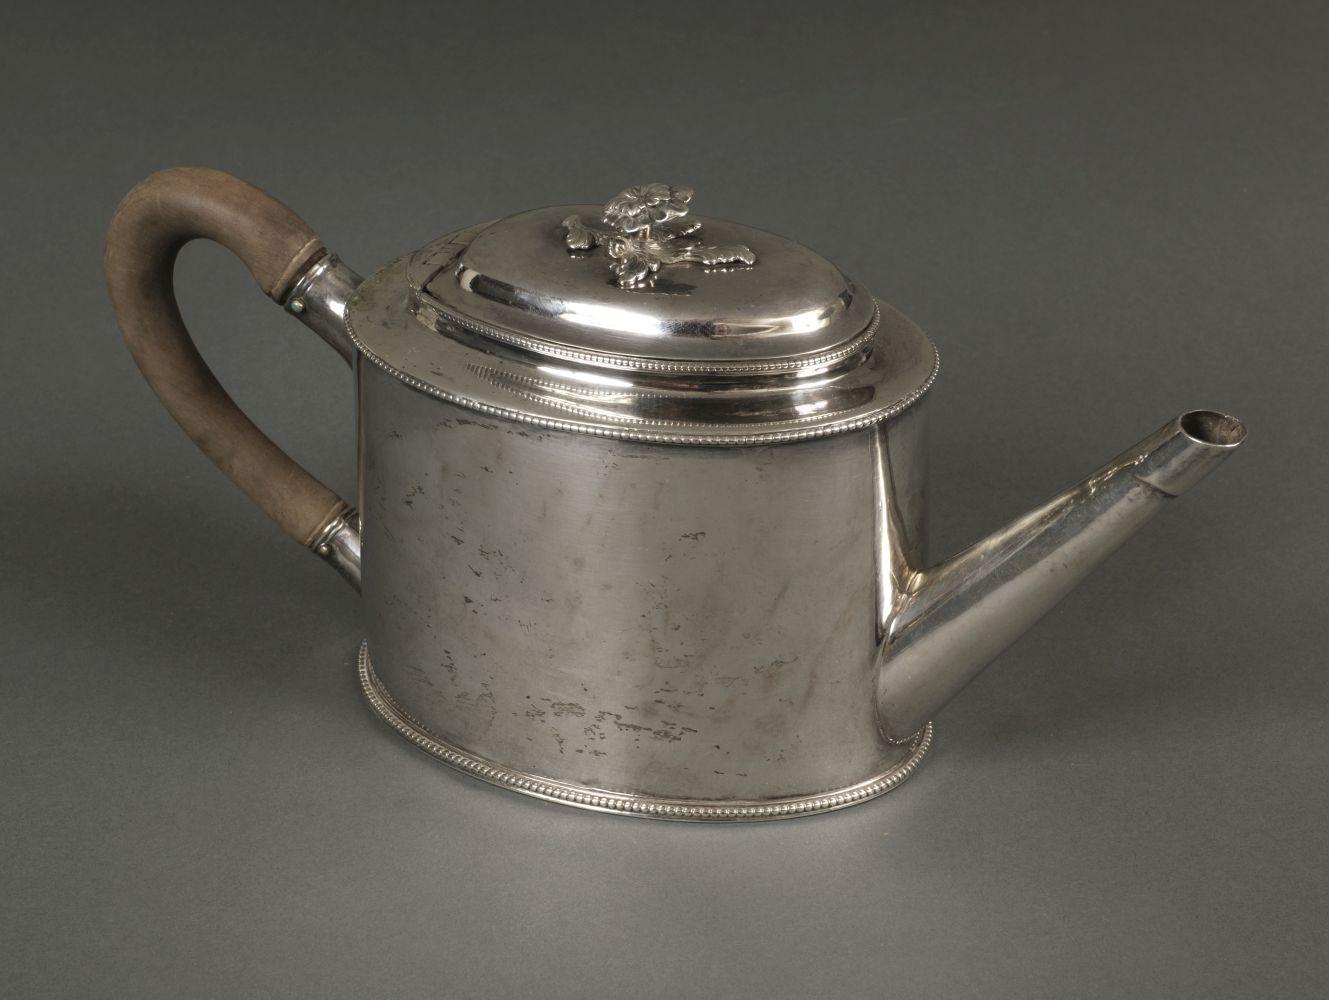 * Teapot. A George III silver teapot by William Turton, London 1783